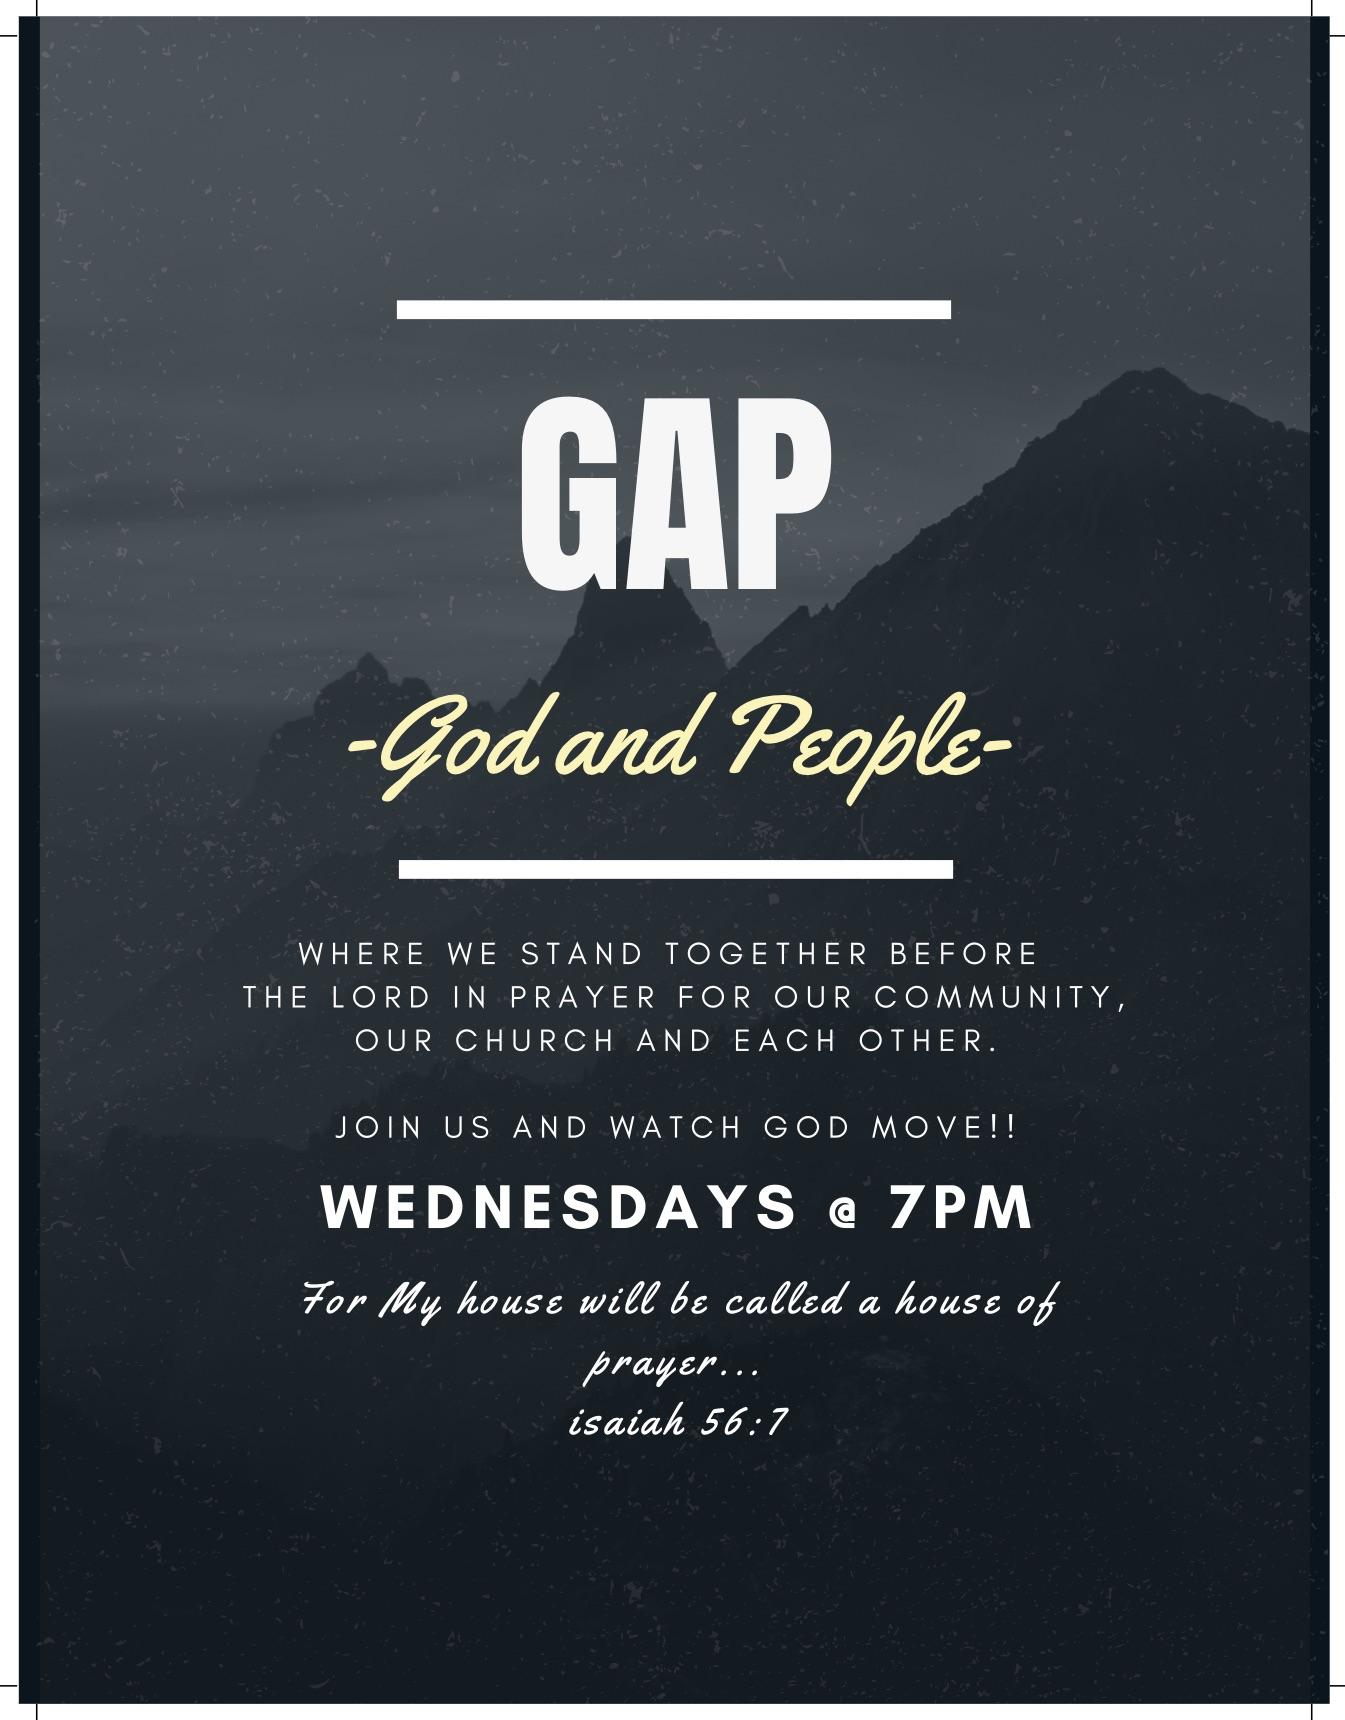 GAP-God and People.jpg